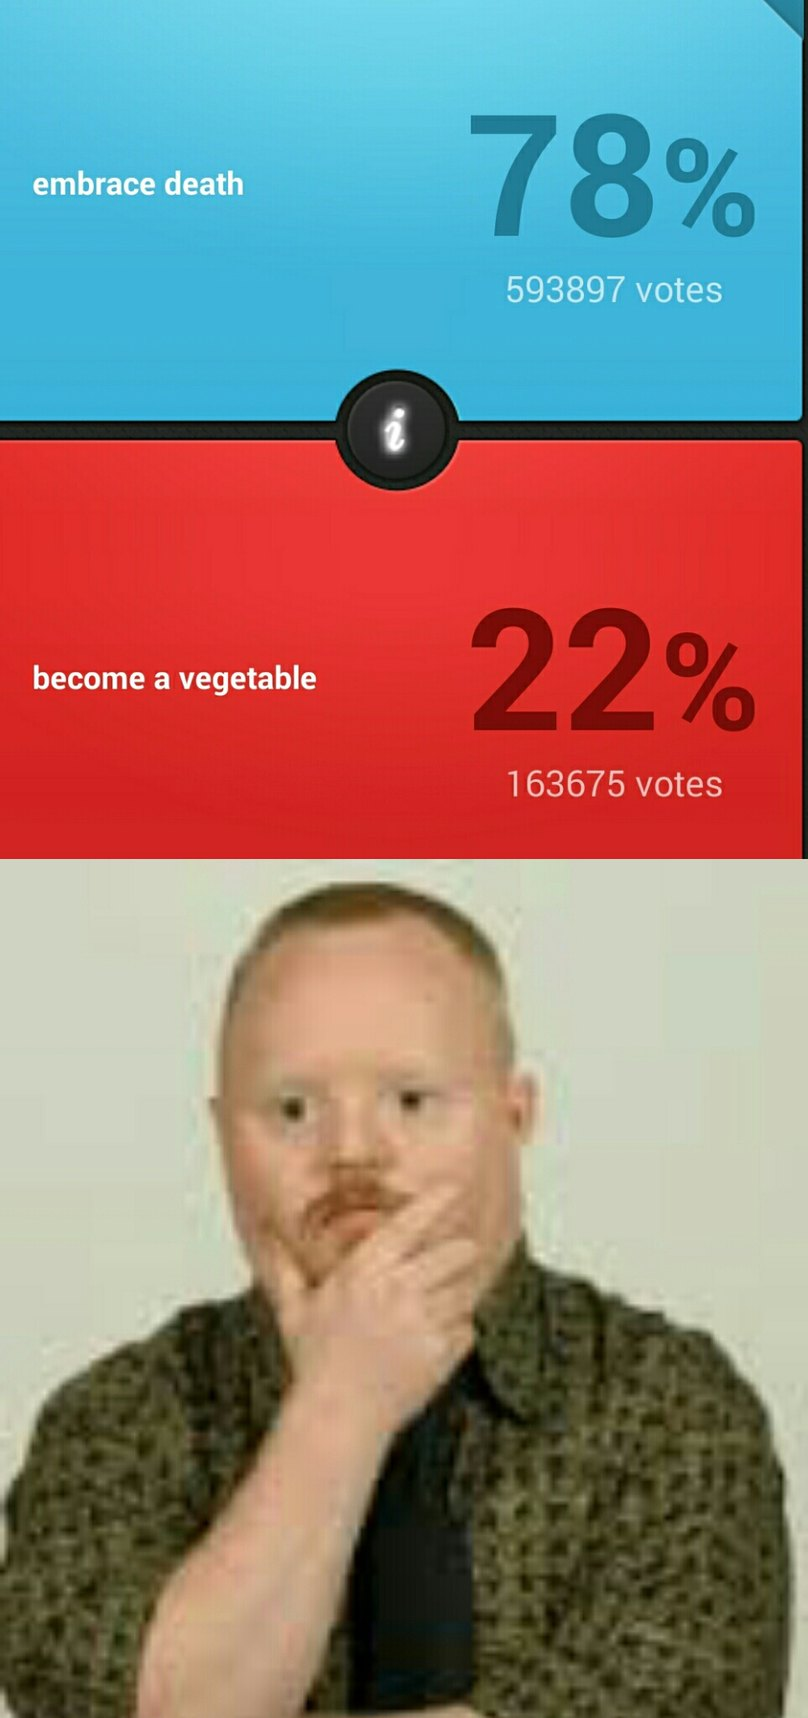 Intredasting - meme